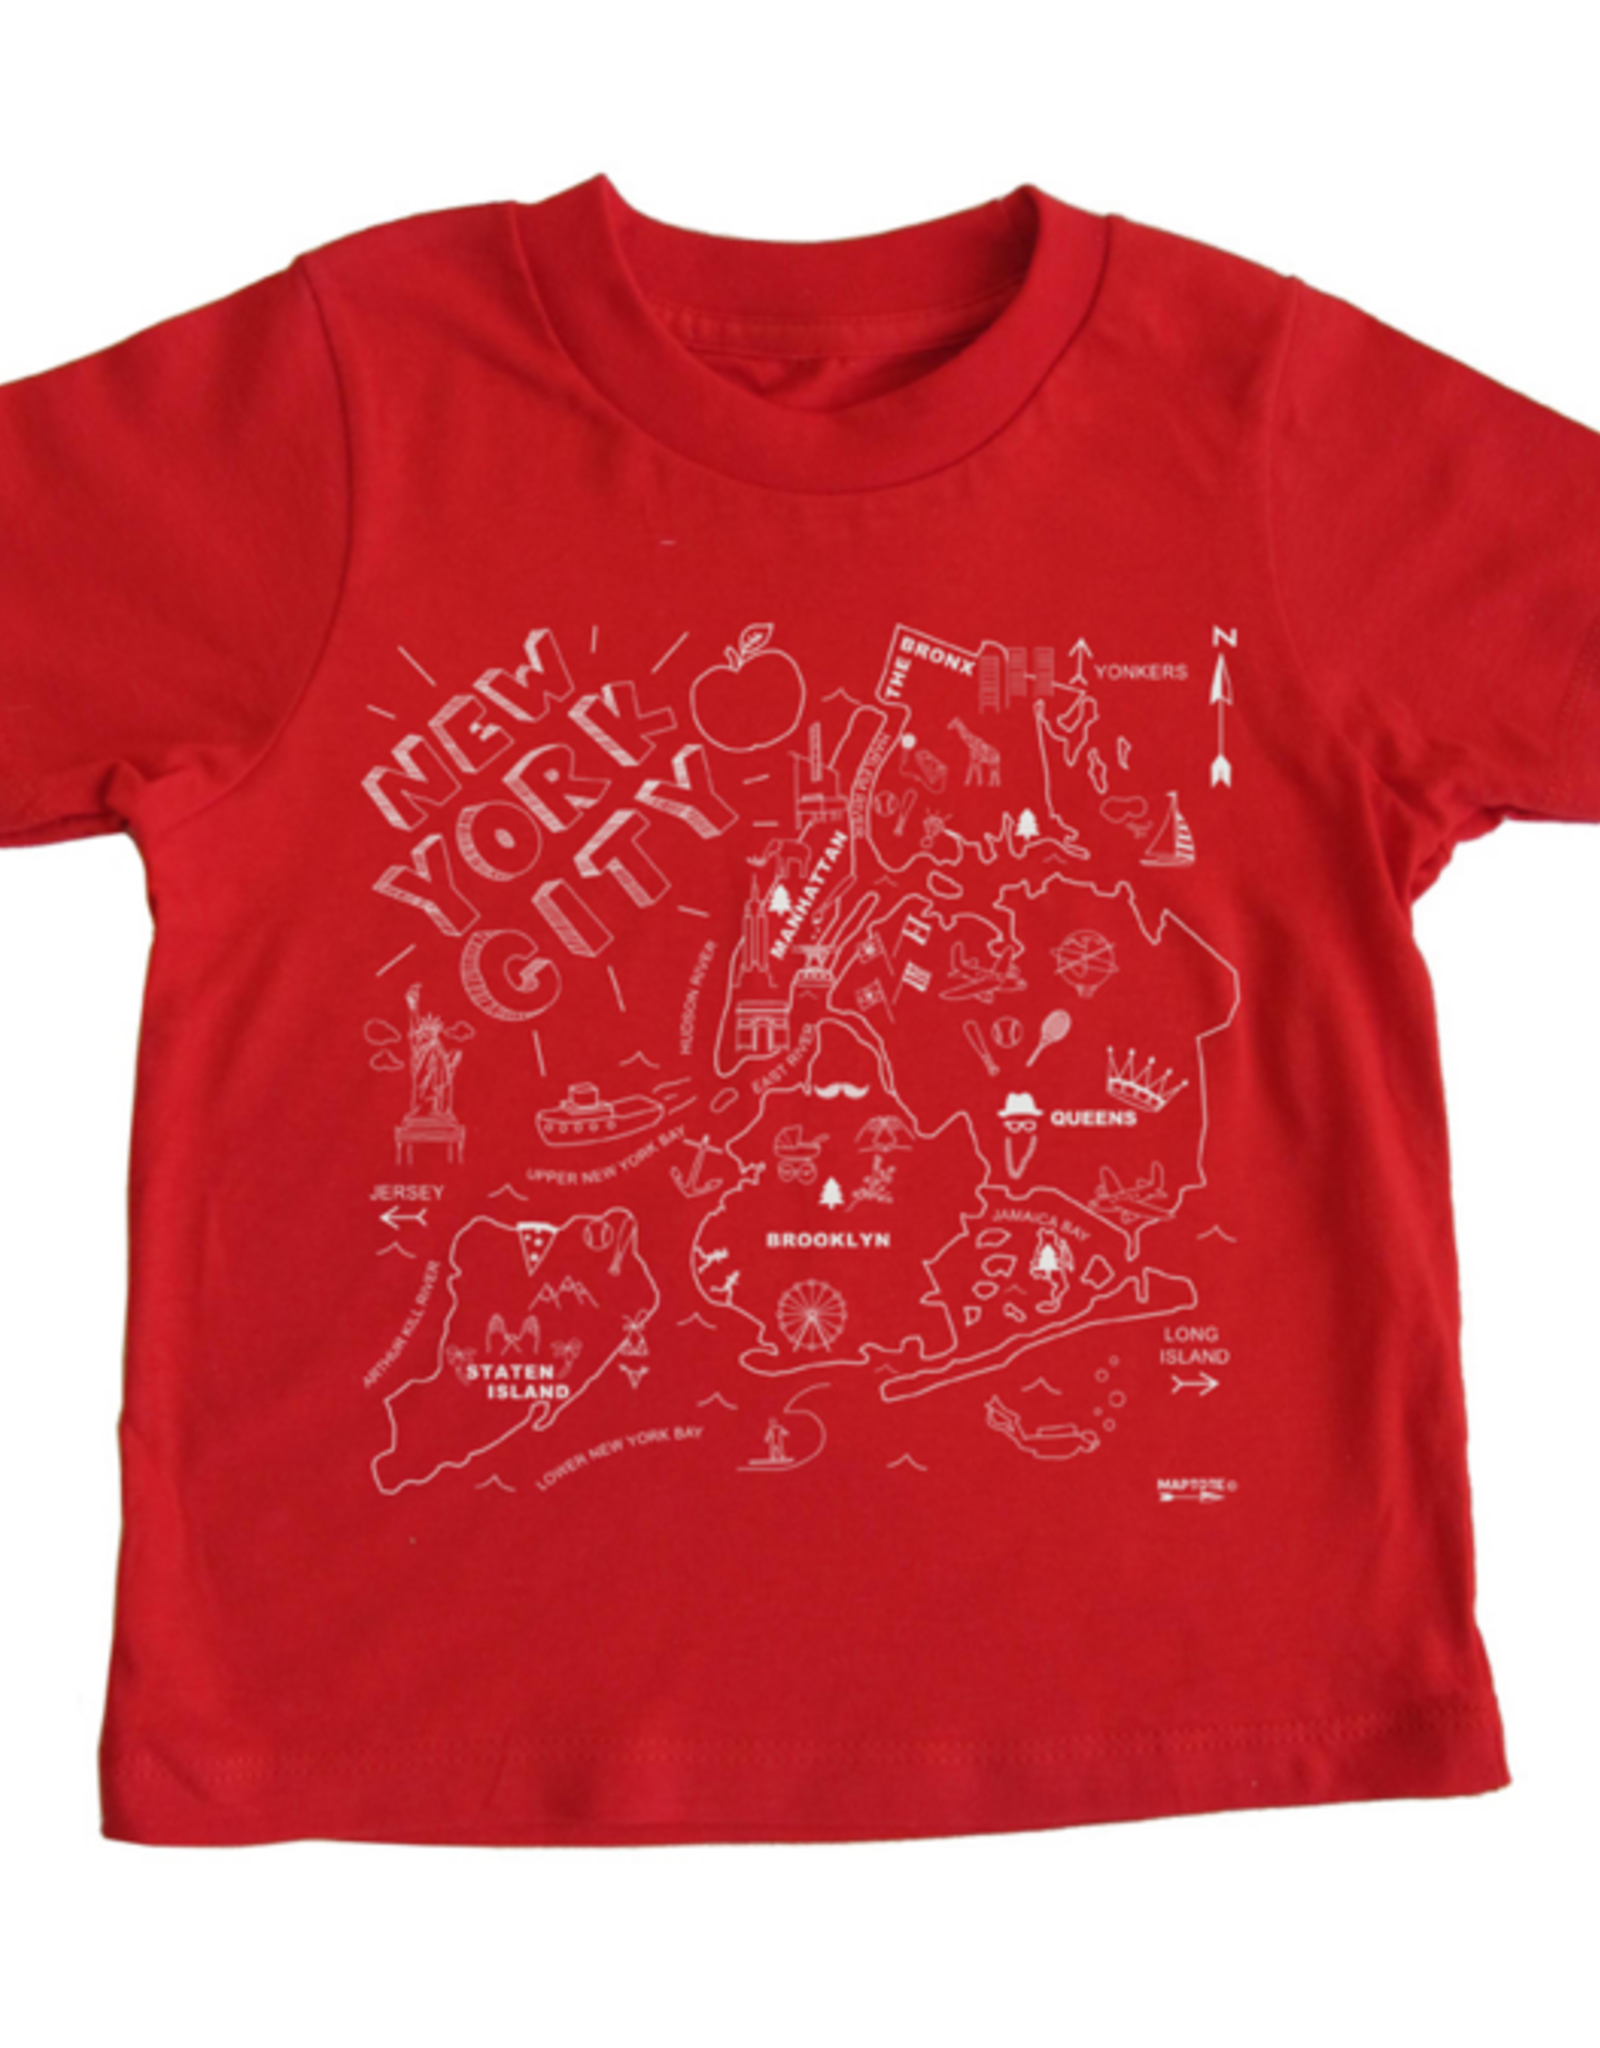 Maptote NYC Toddler T-Shirt